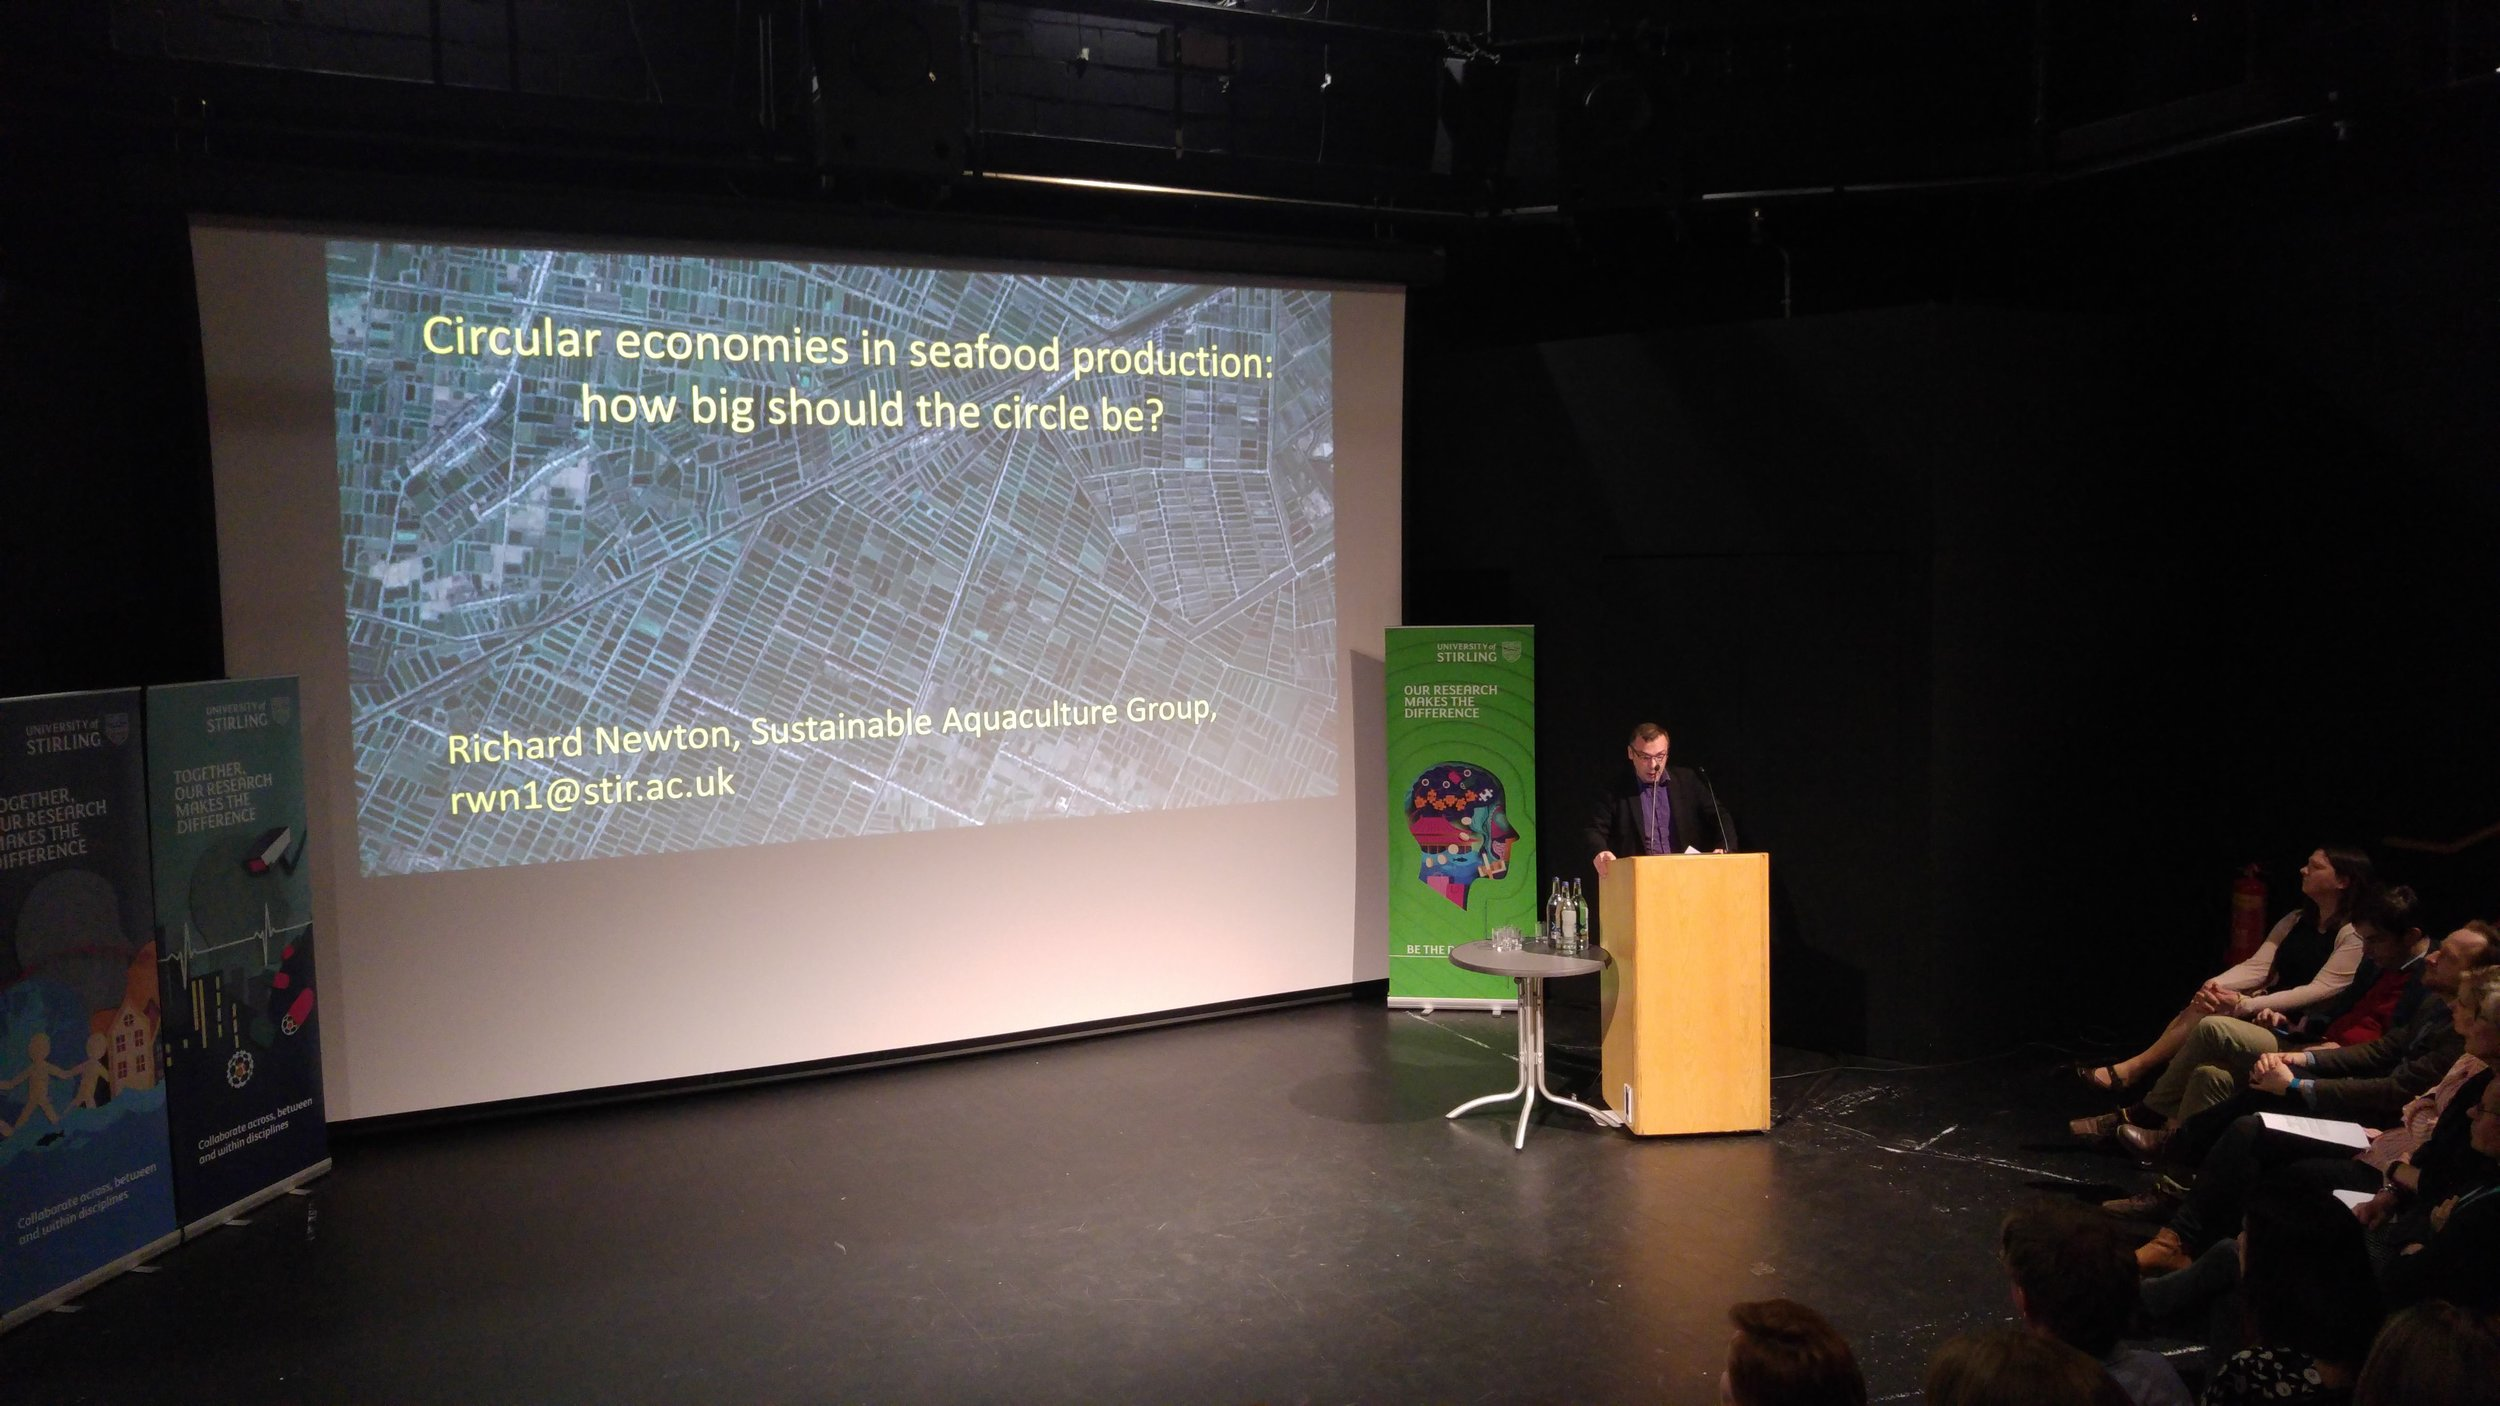 Richard Newton presenting on circular economies in seafood production